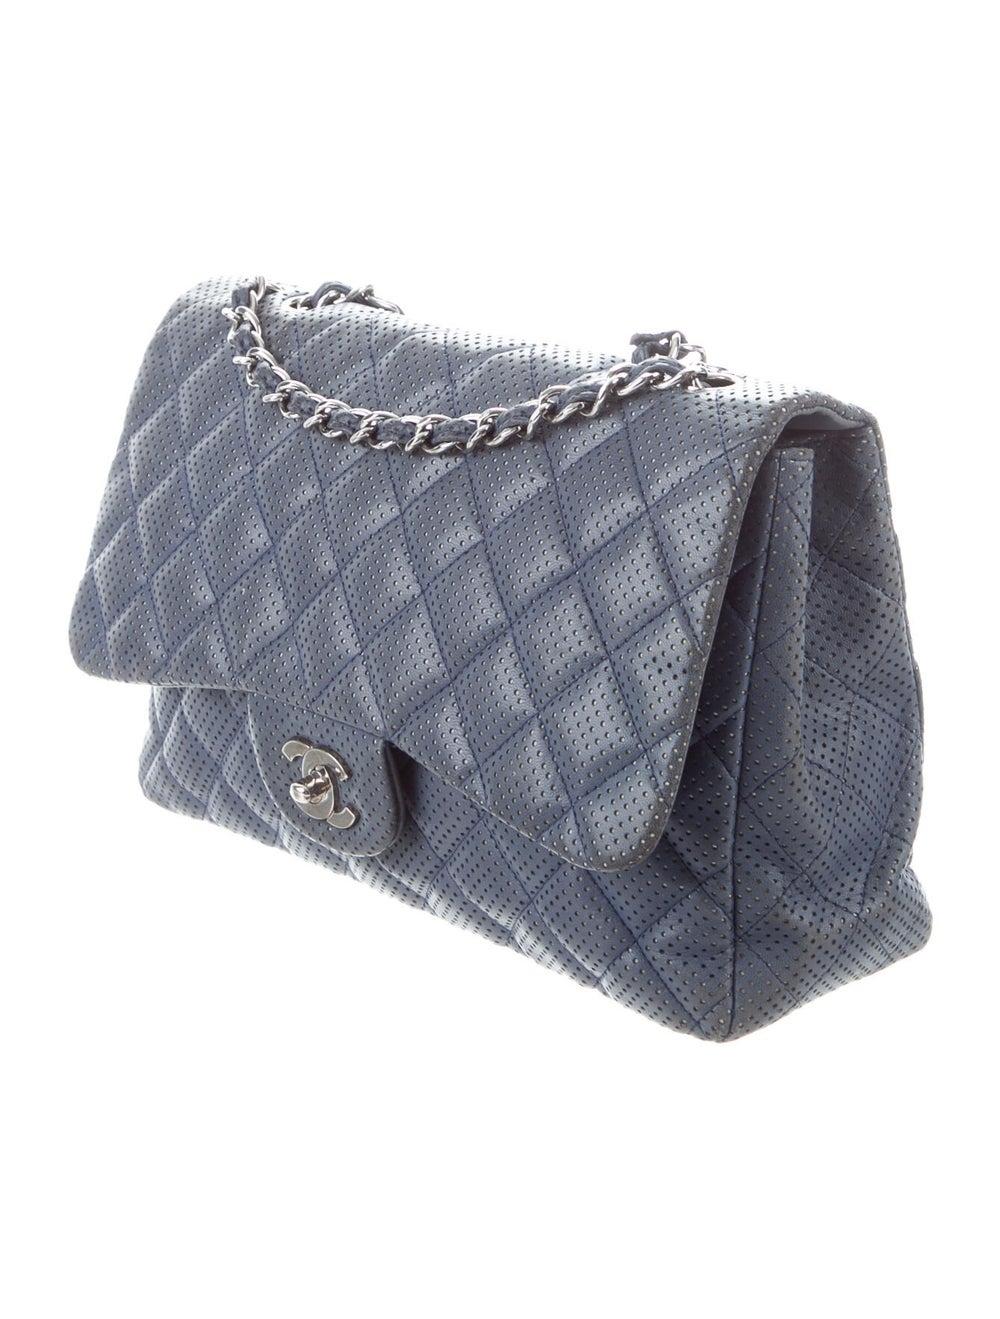 Chanel Classic Jumbo Single Flap Bag Blue - image 3